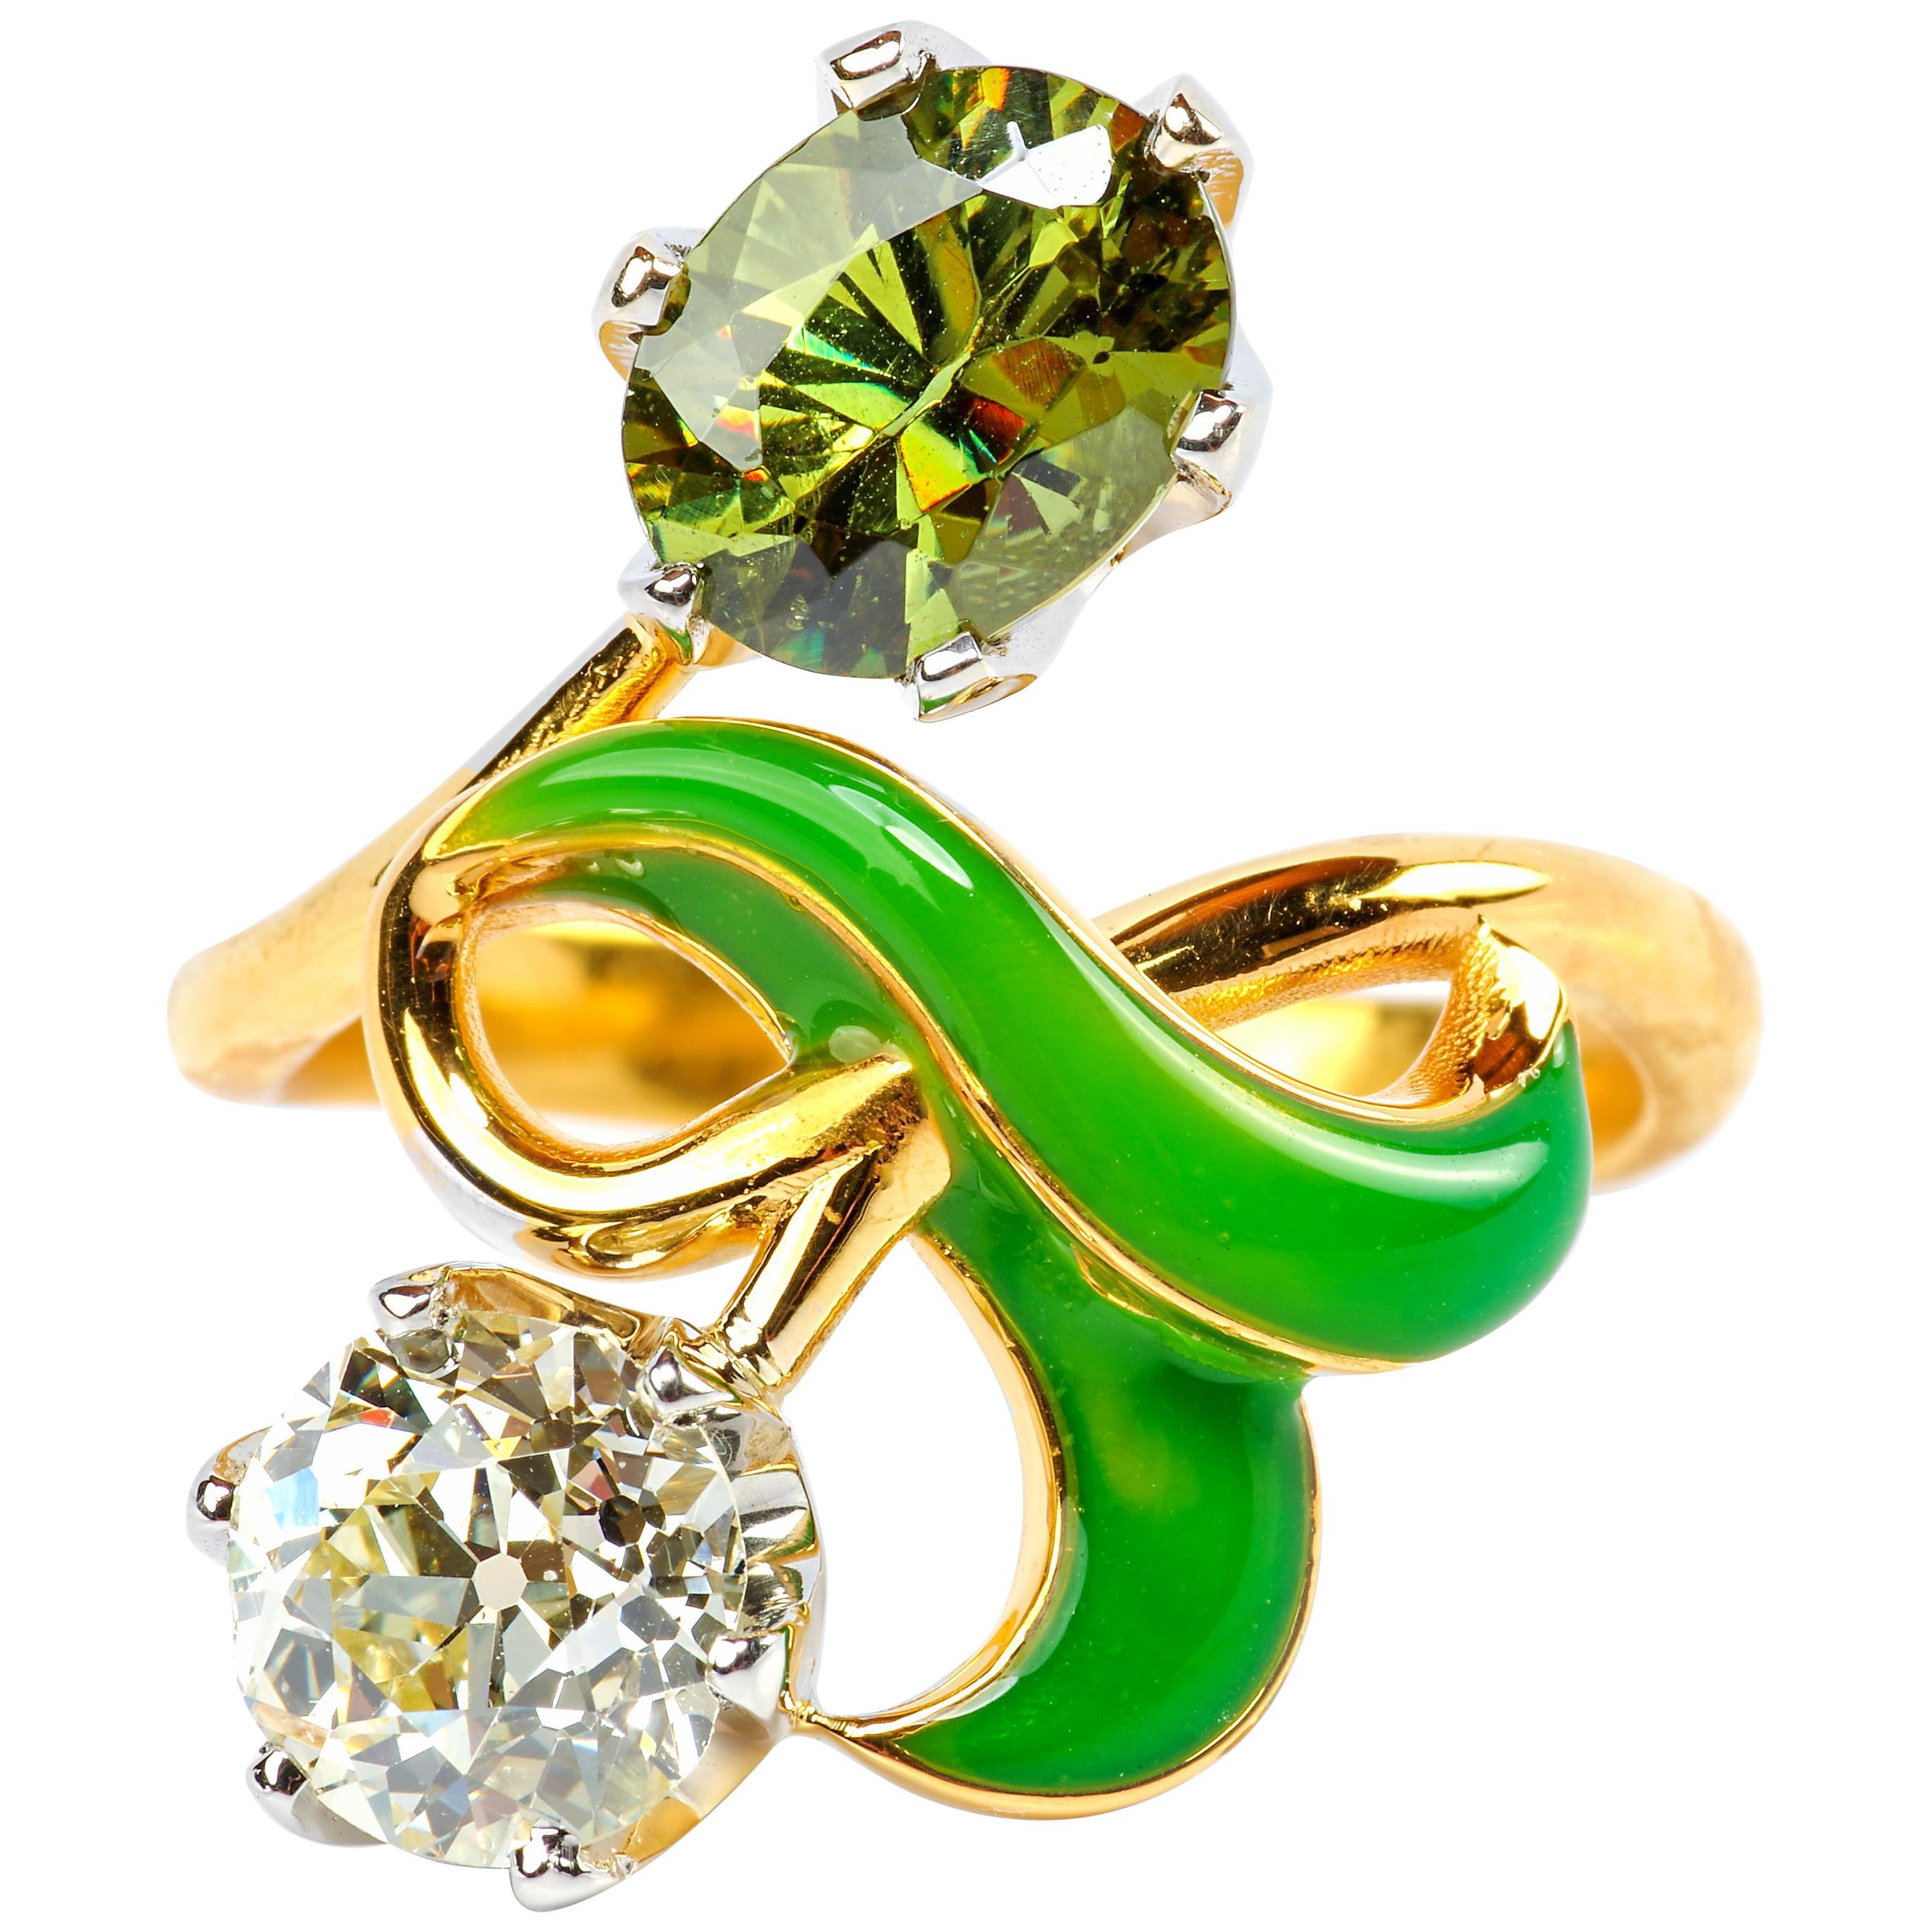 Demantoid Garnet and Diamond Ring Art Nouveau Style